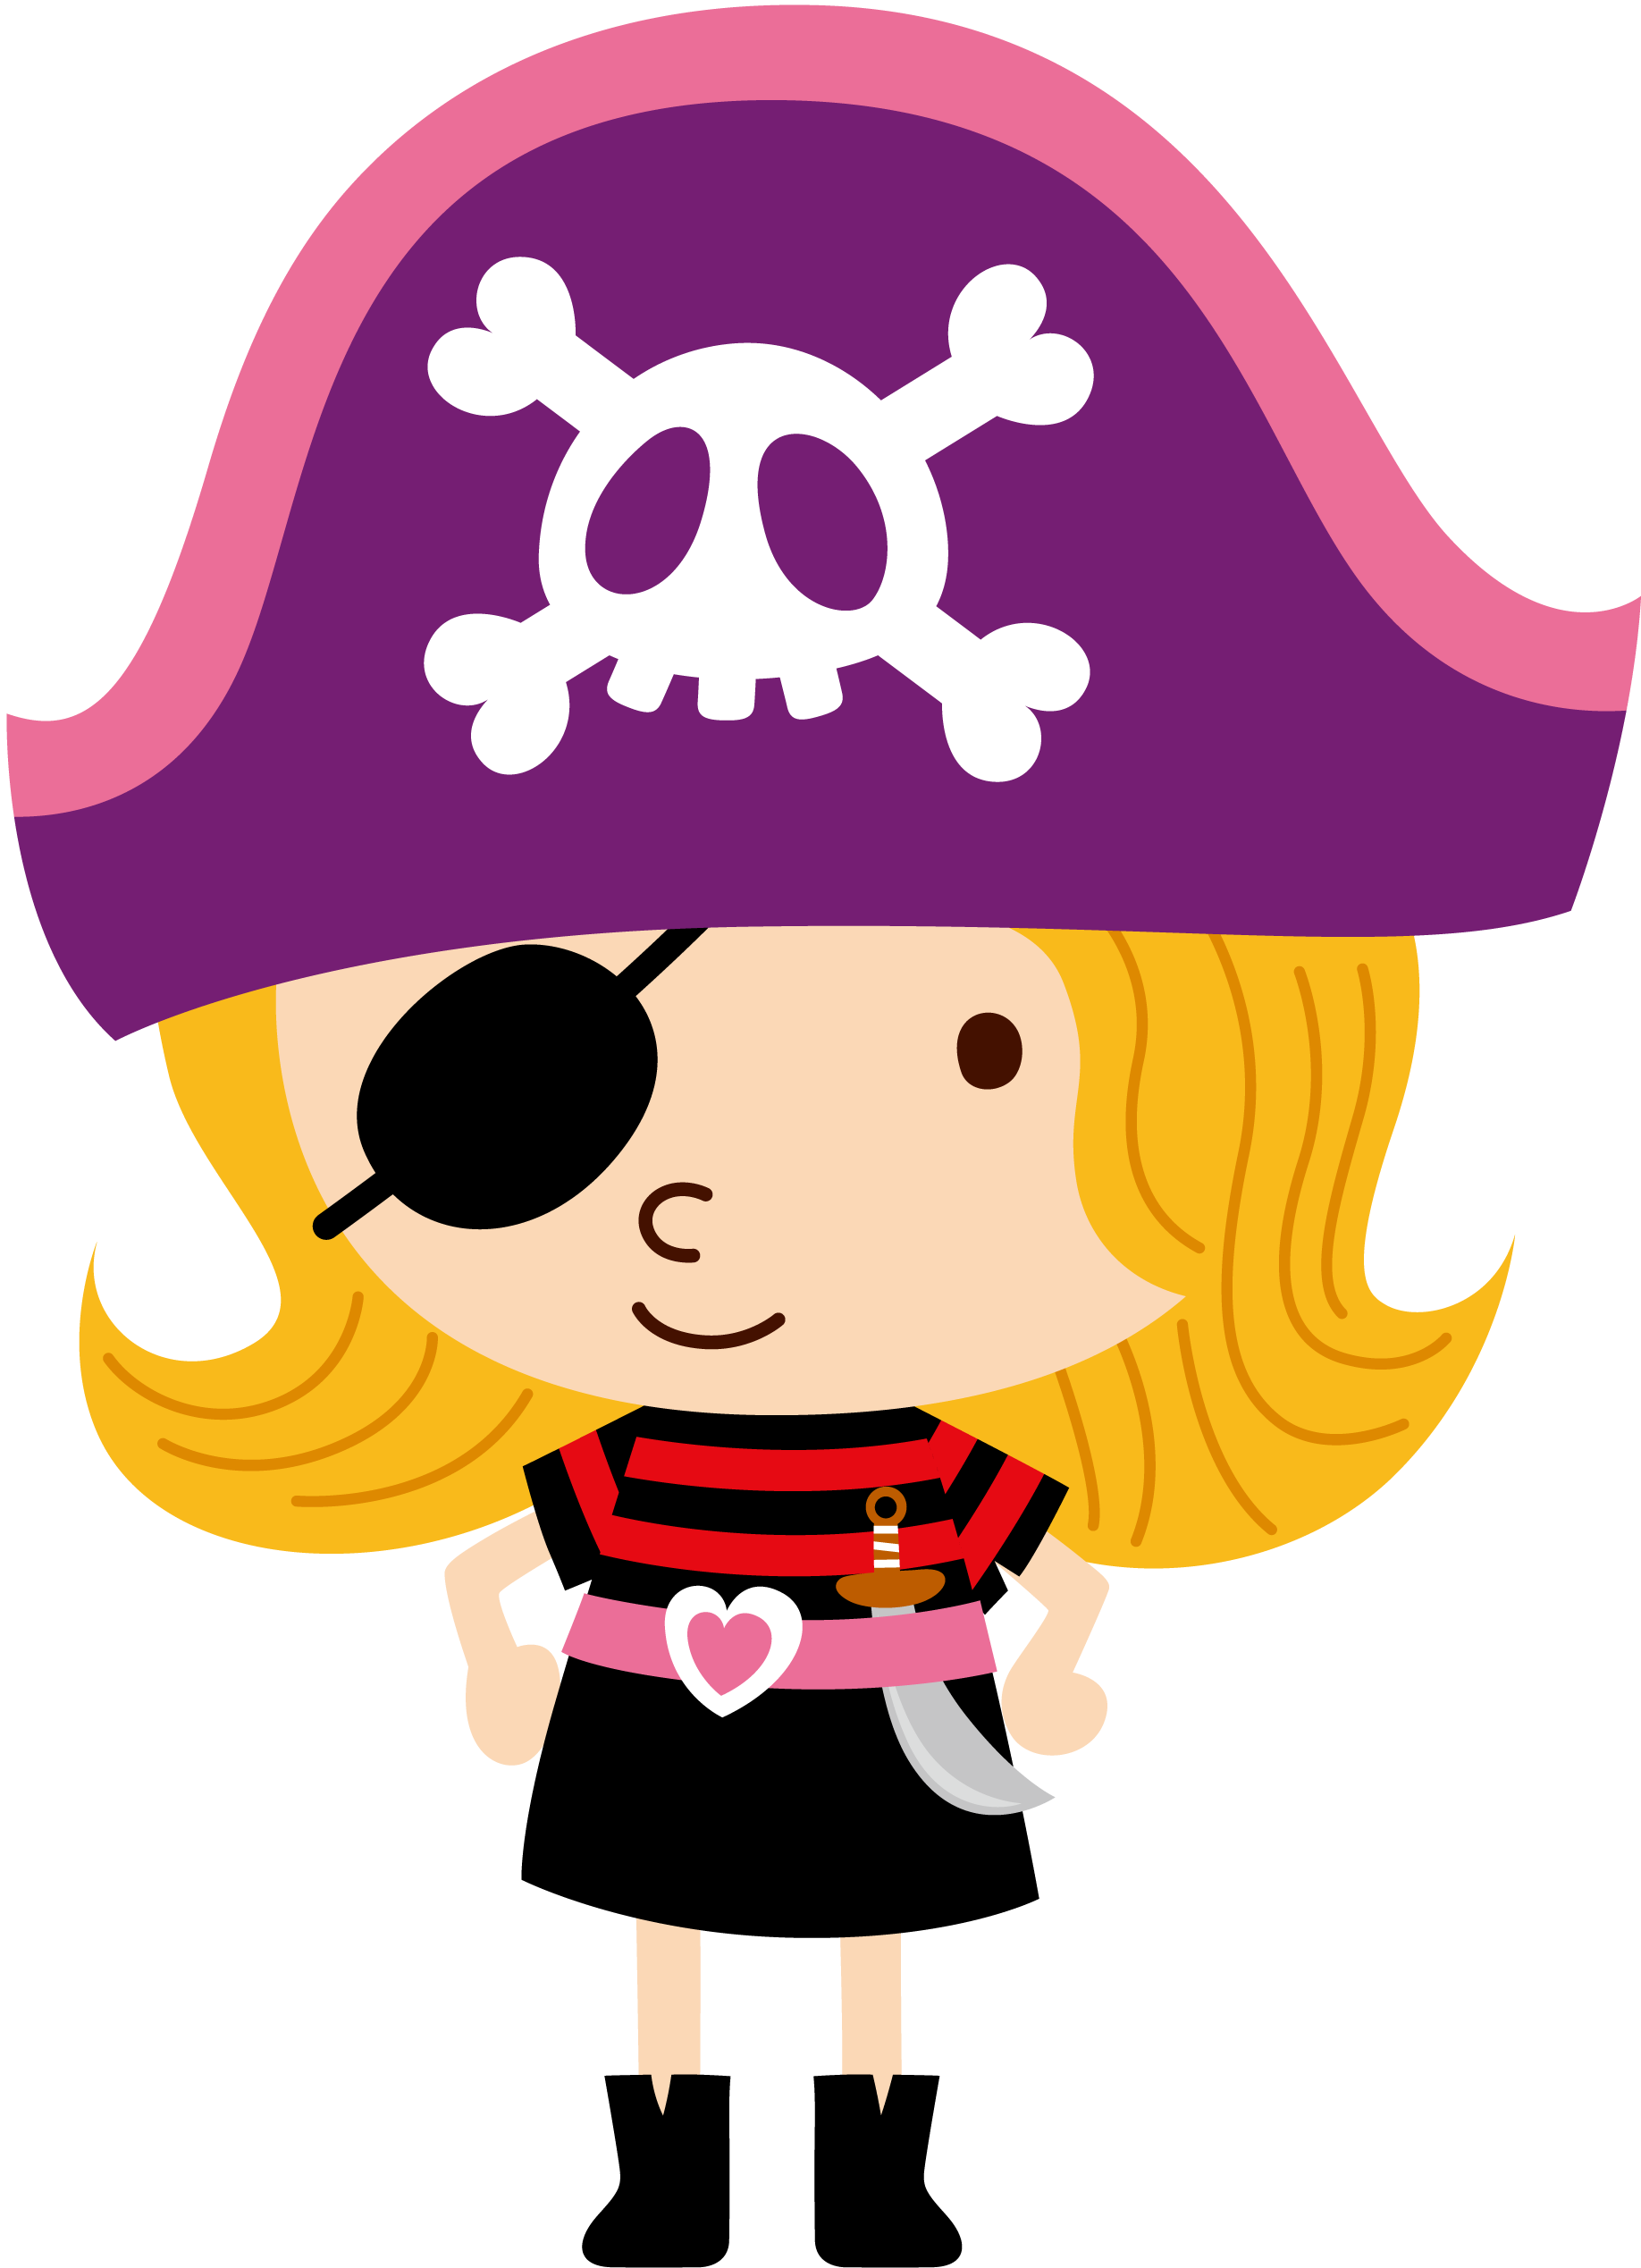 Ibigl3zatwx30e Png 1836 215 2537 Piratas Pinterest Piratas Caricaturas Y Fiesta Cumplea 241 Os